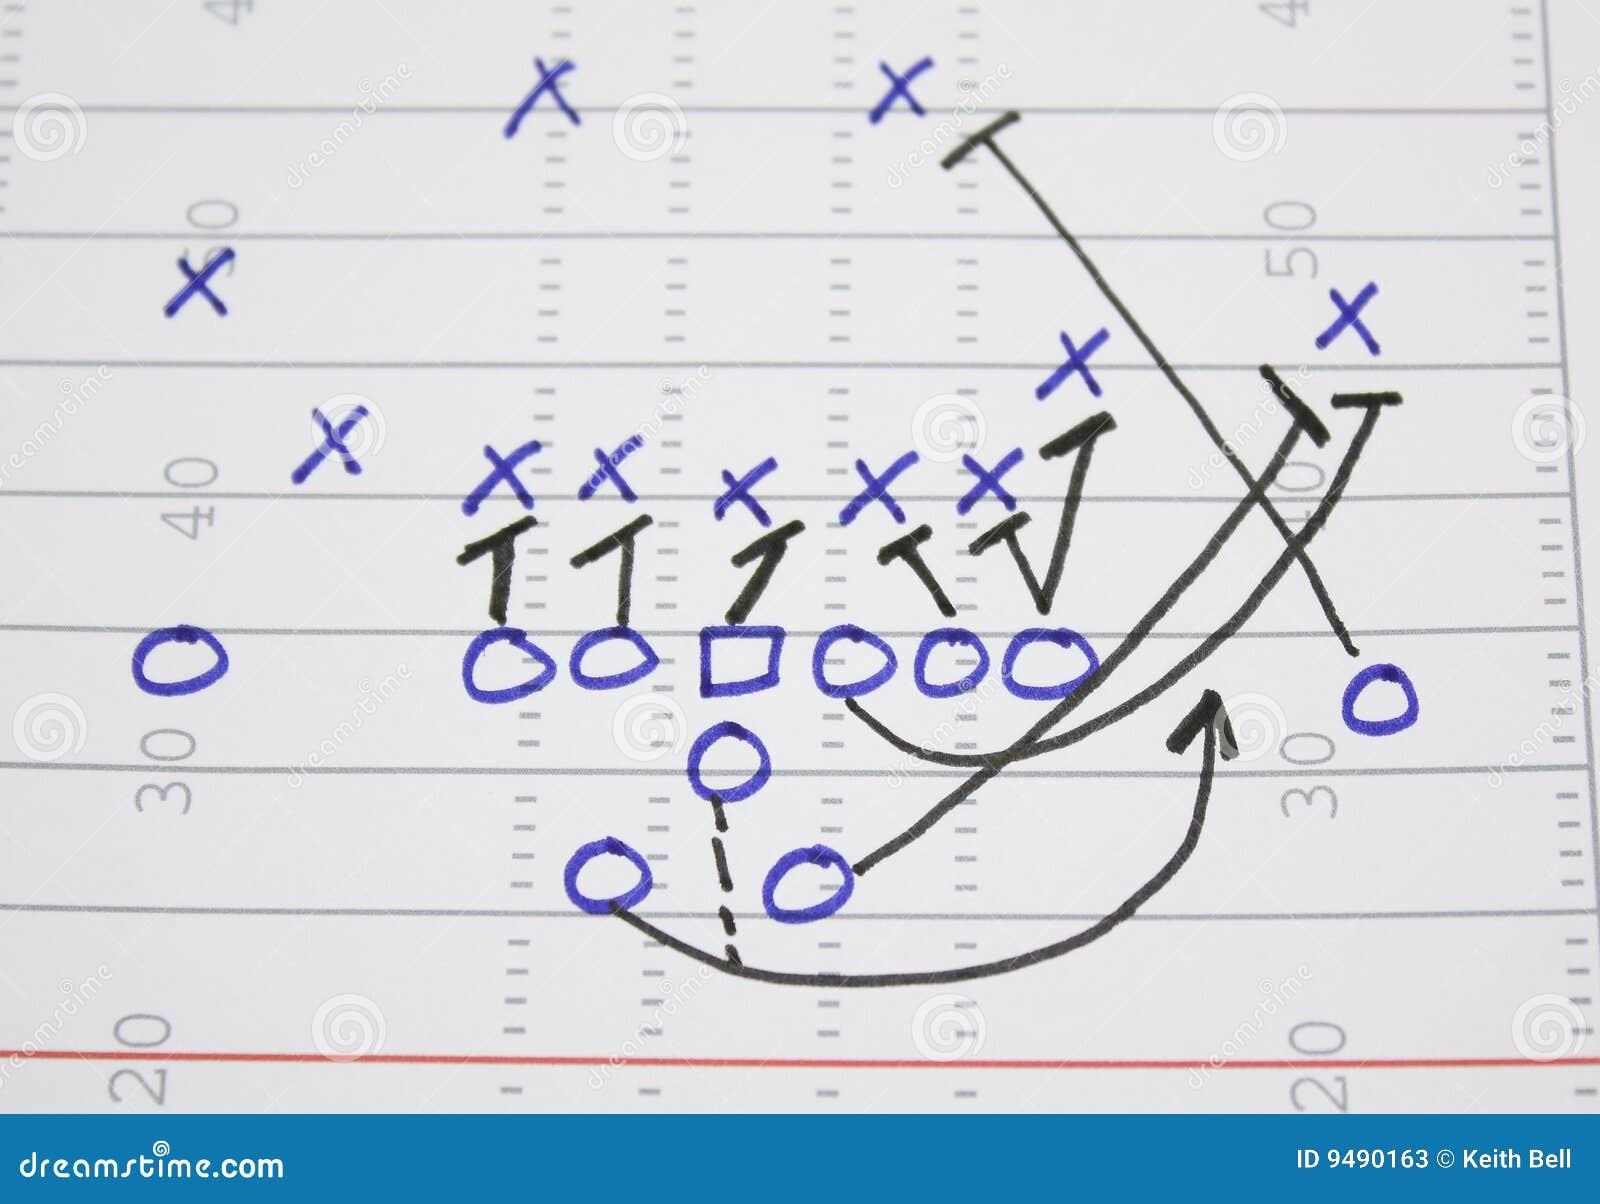 football play sweep diagram stock photos image 9490163